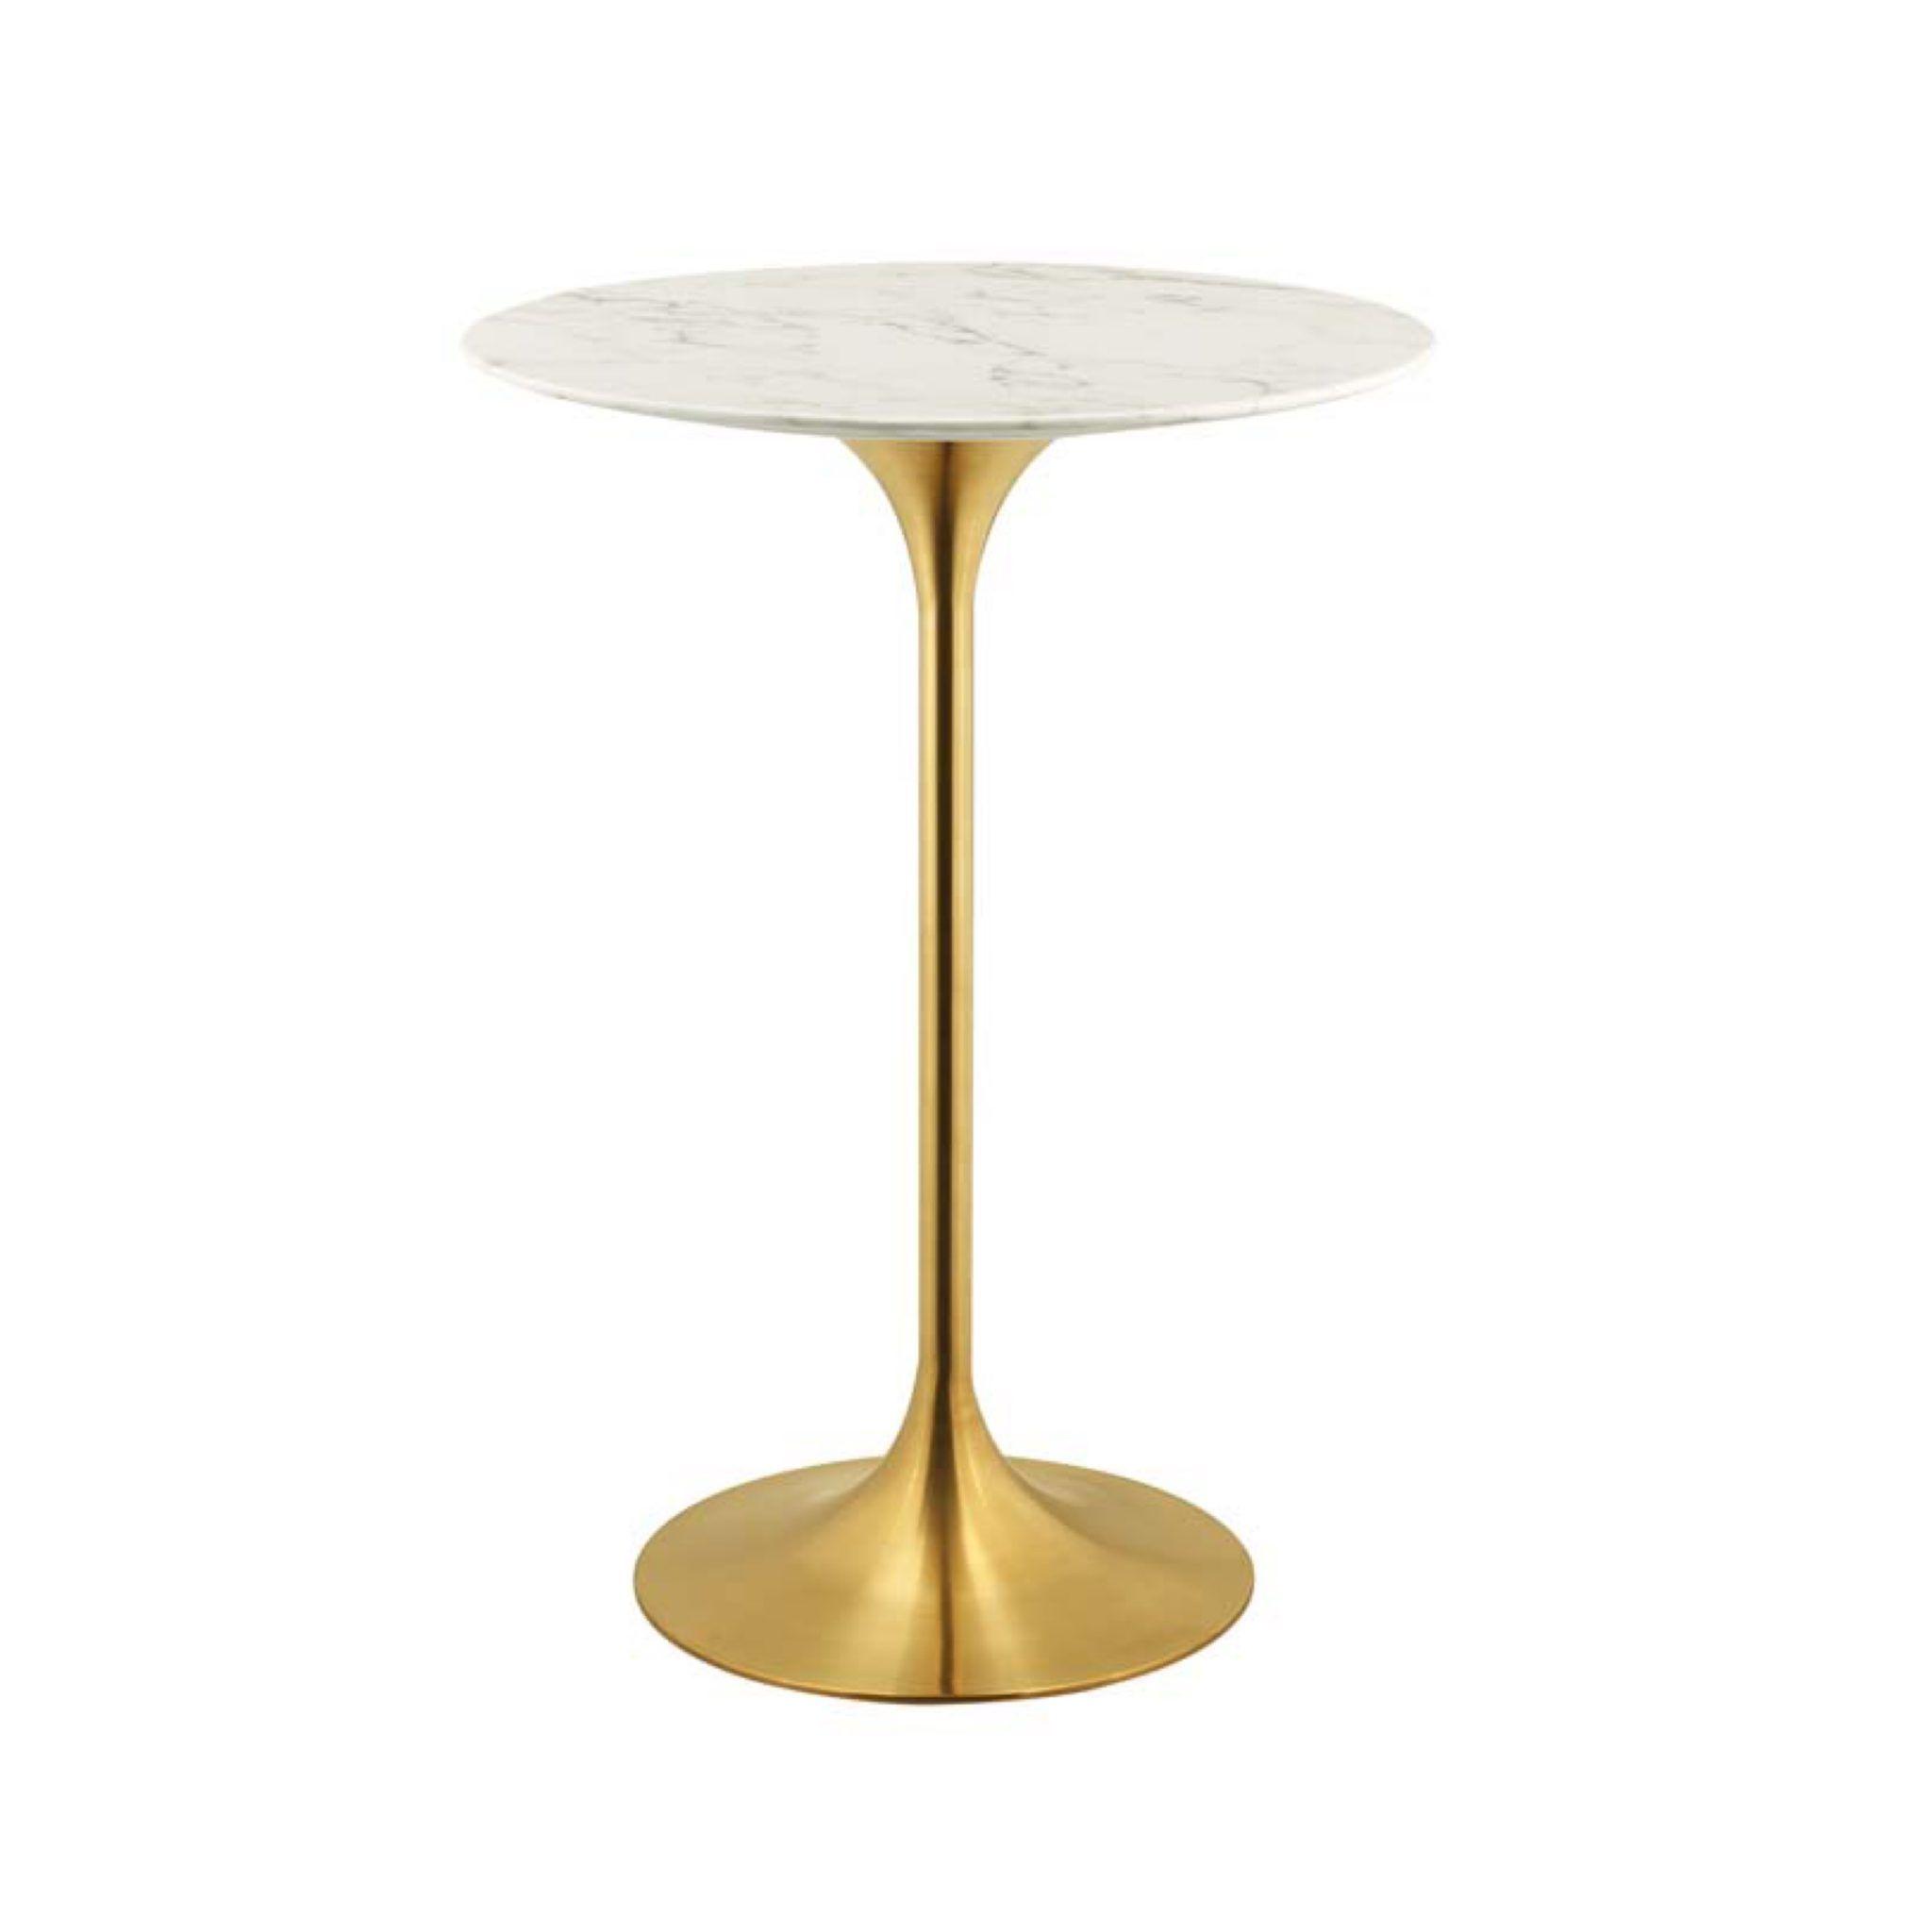 Camila Highboy Table Highboy Table Table Table Dimensions